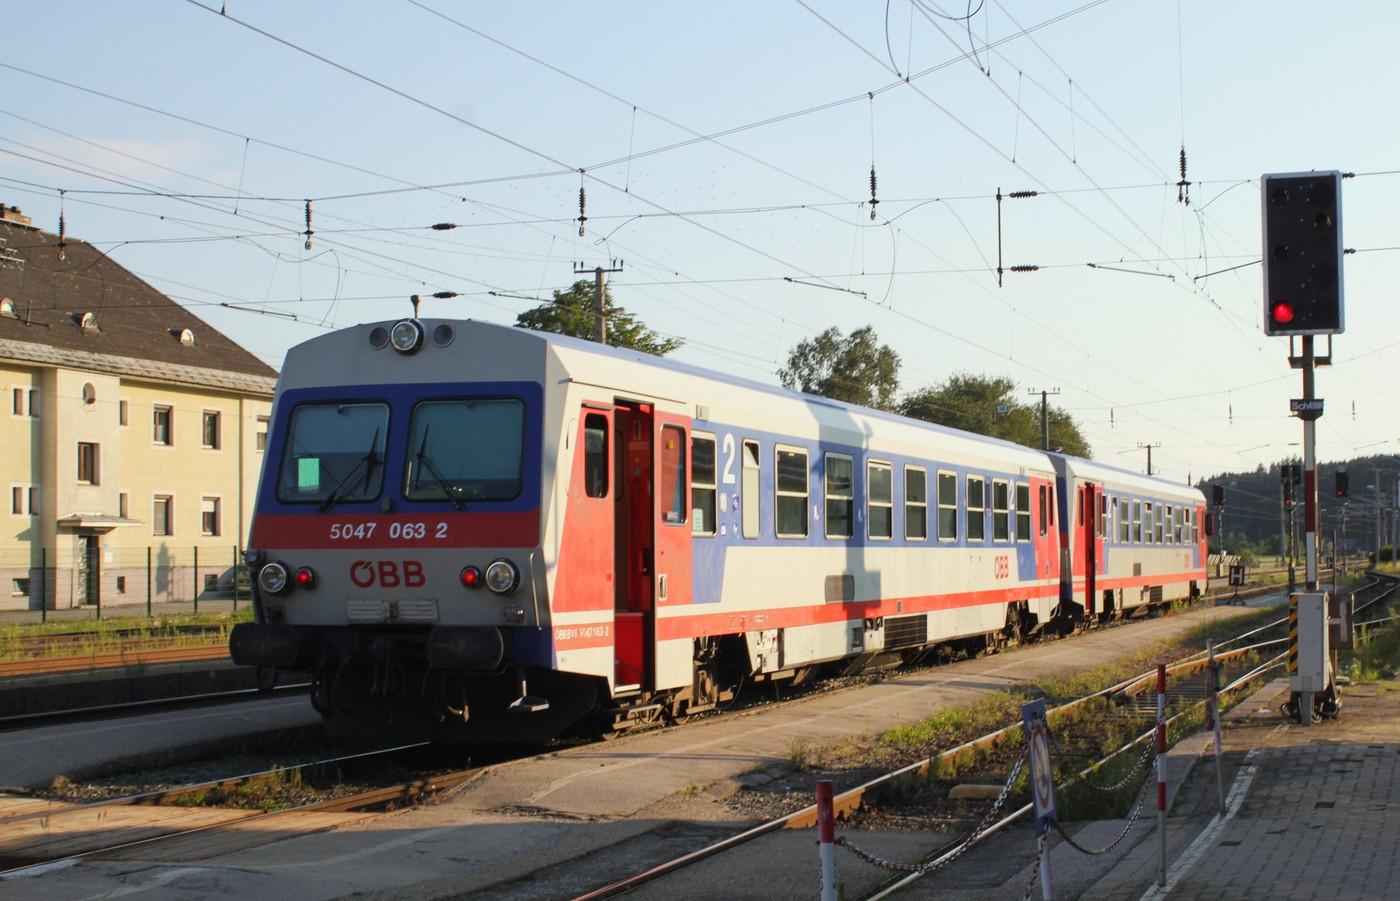 http://www.eisenbahn-im-bild.de/Temp/A_Steindorf_IMG_4911.jpg